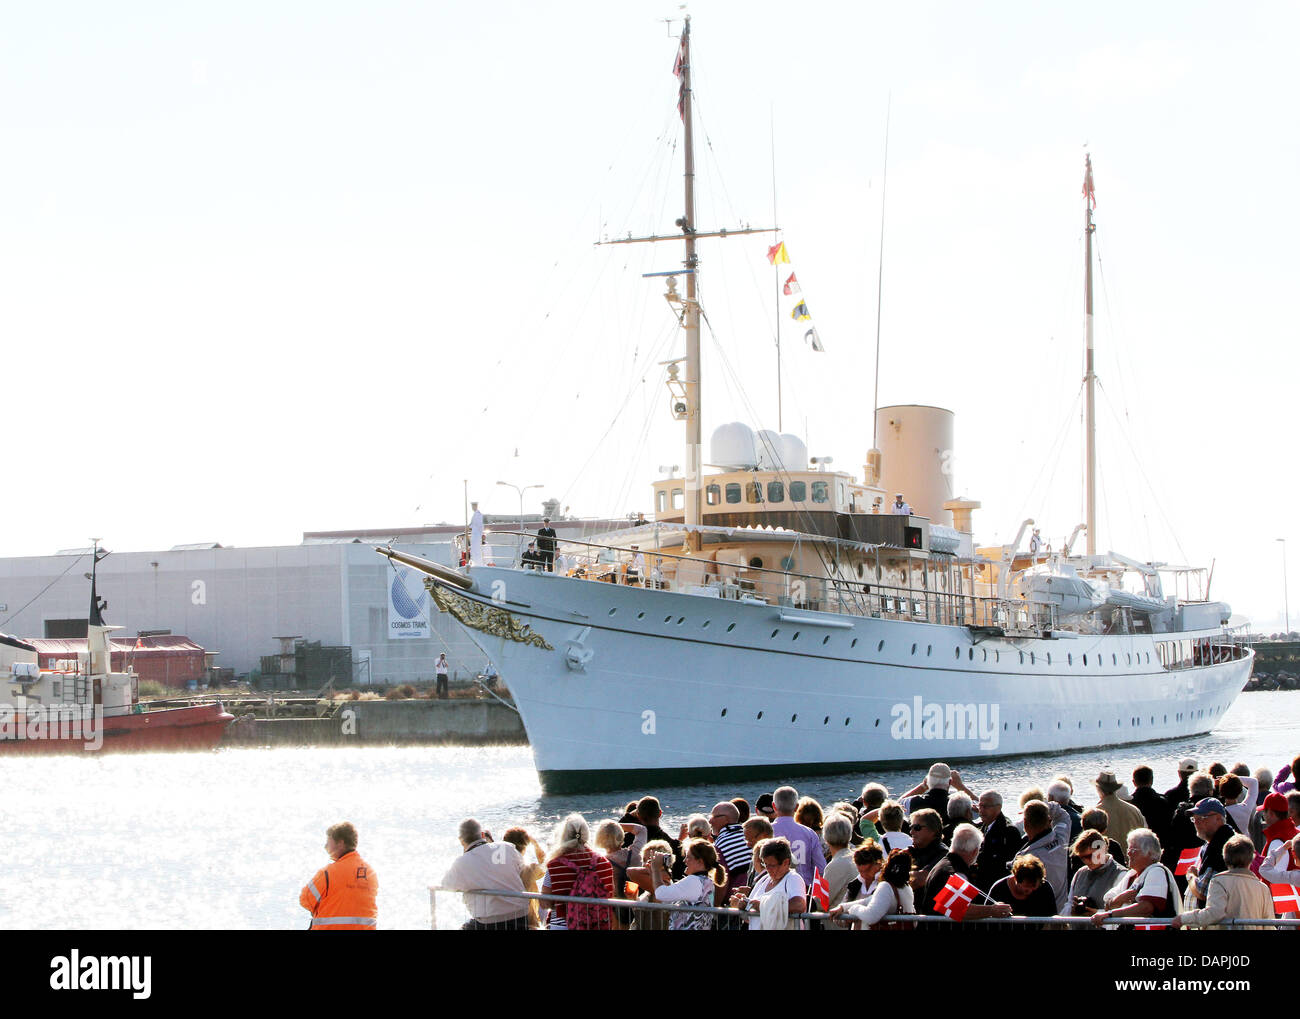 Danish royal yacht Dannebrog arrives on 22 August 2011 in Skage, Denmark, during their summer of the Danish royals. - Stock Image